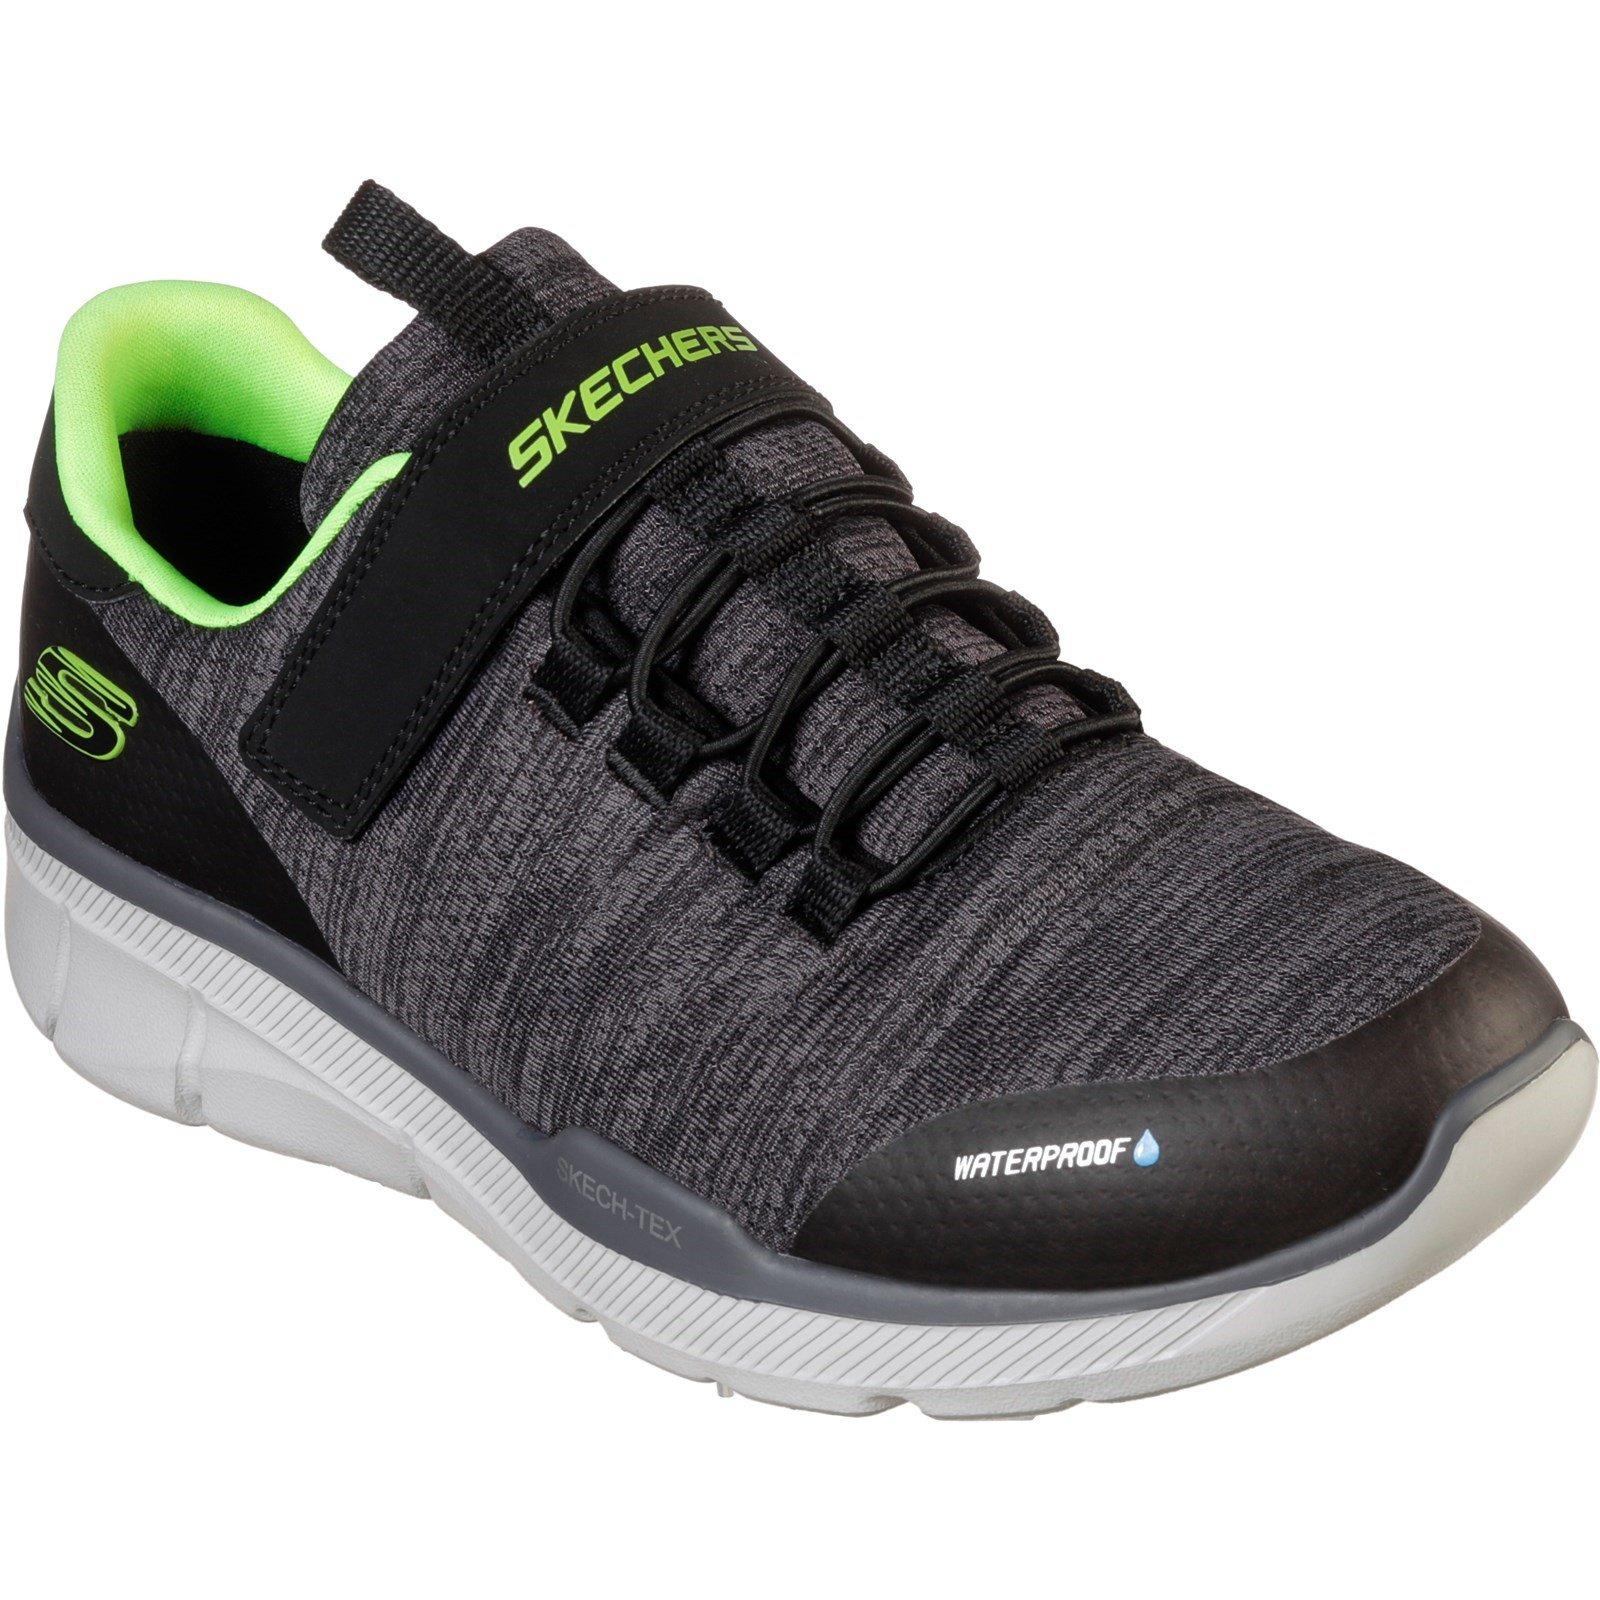 Skechers Unisex Equalizer 3.0 Aquablast Trainer Black 28533 - Black/Charcoal 13.5